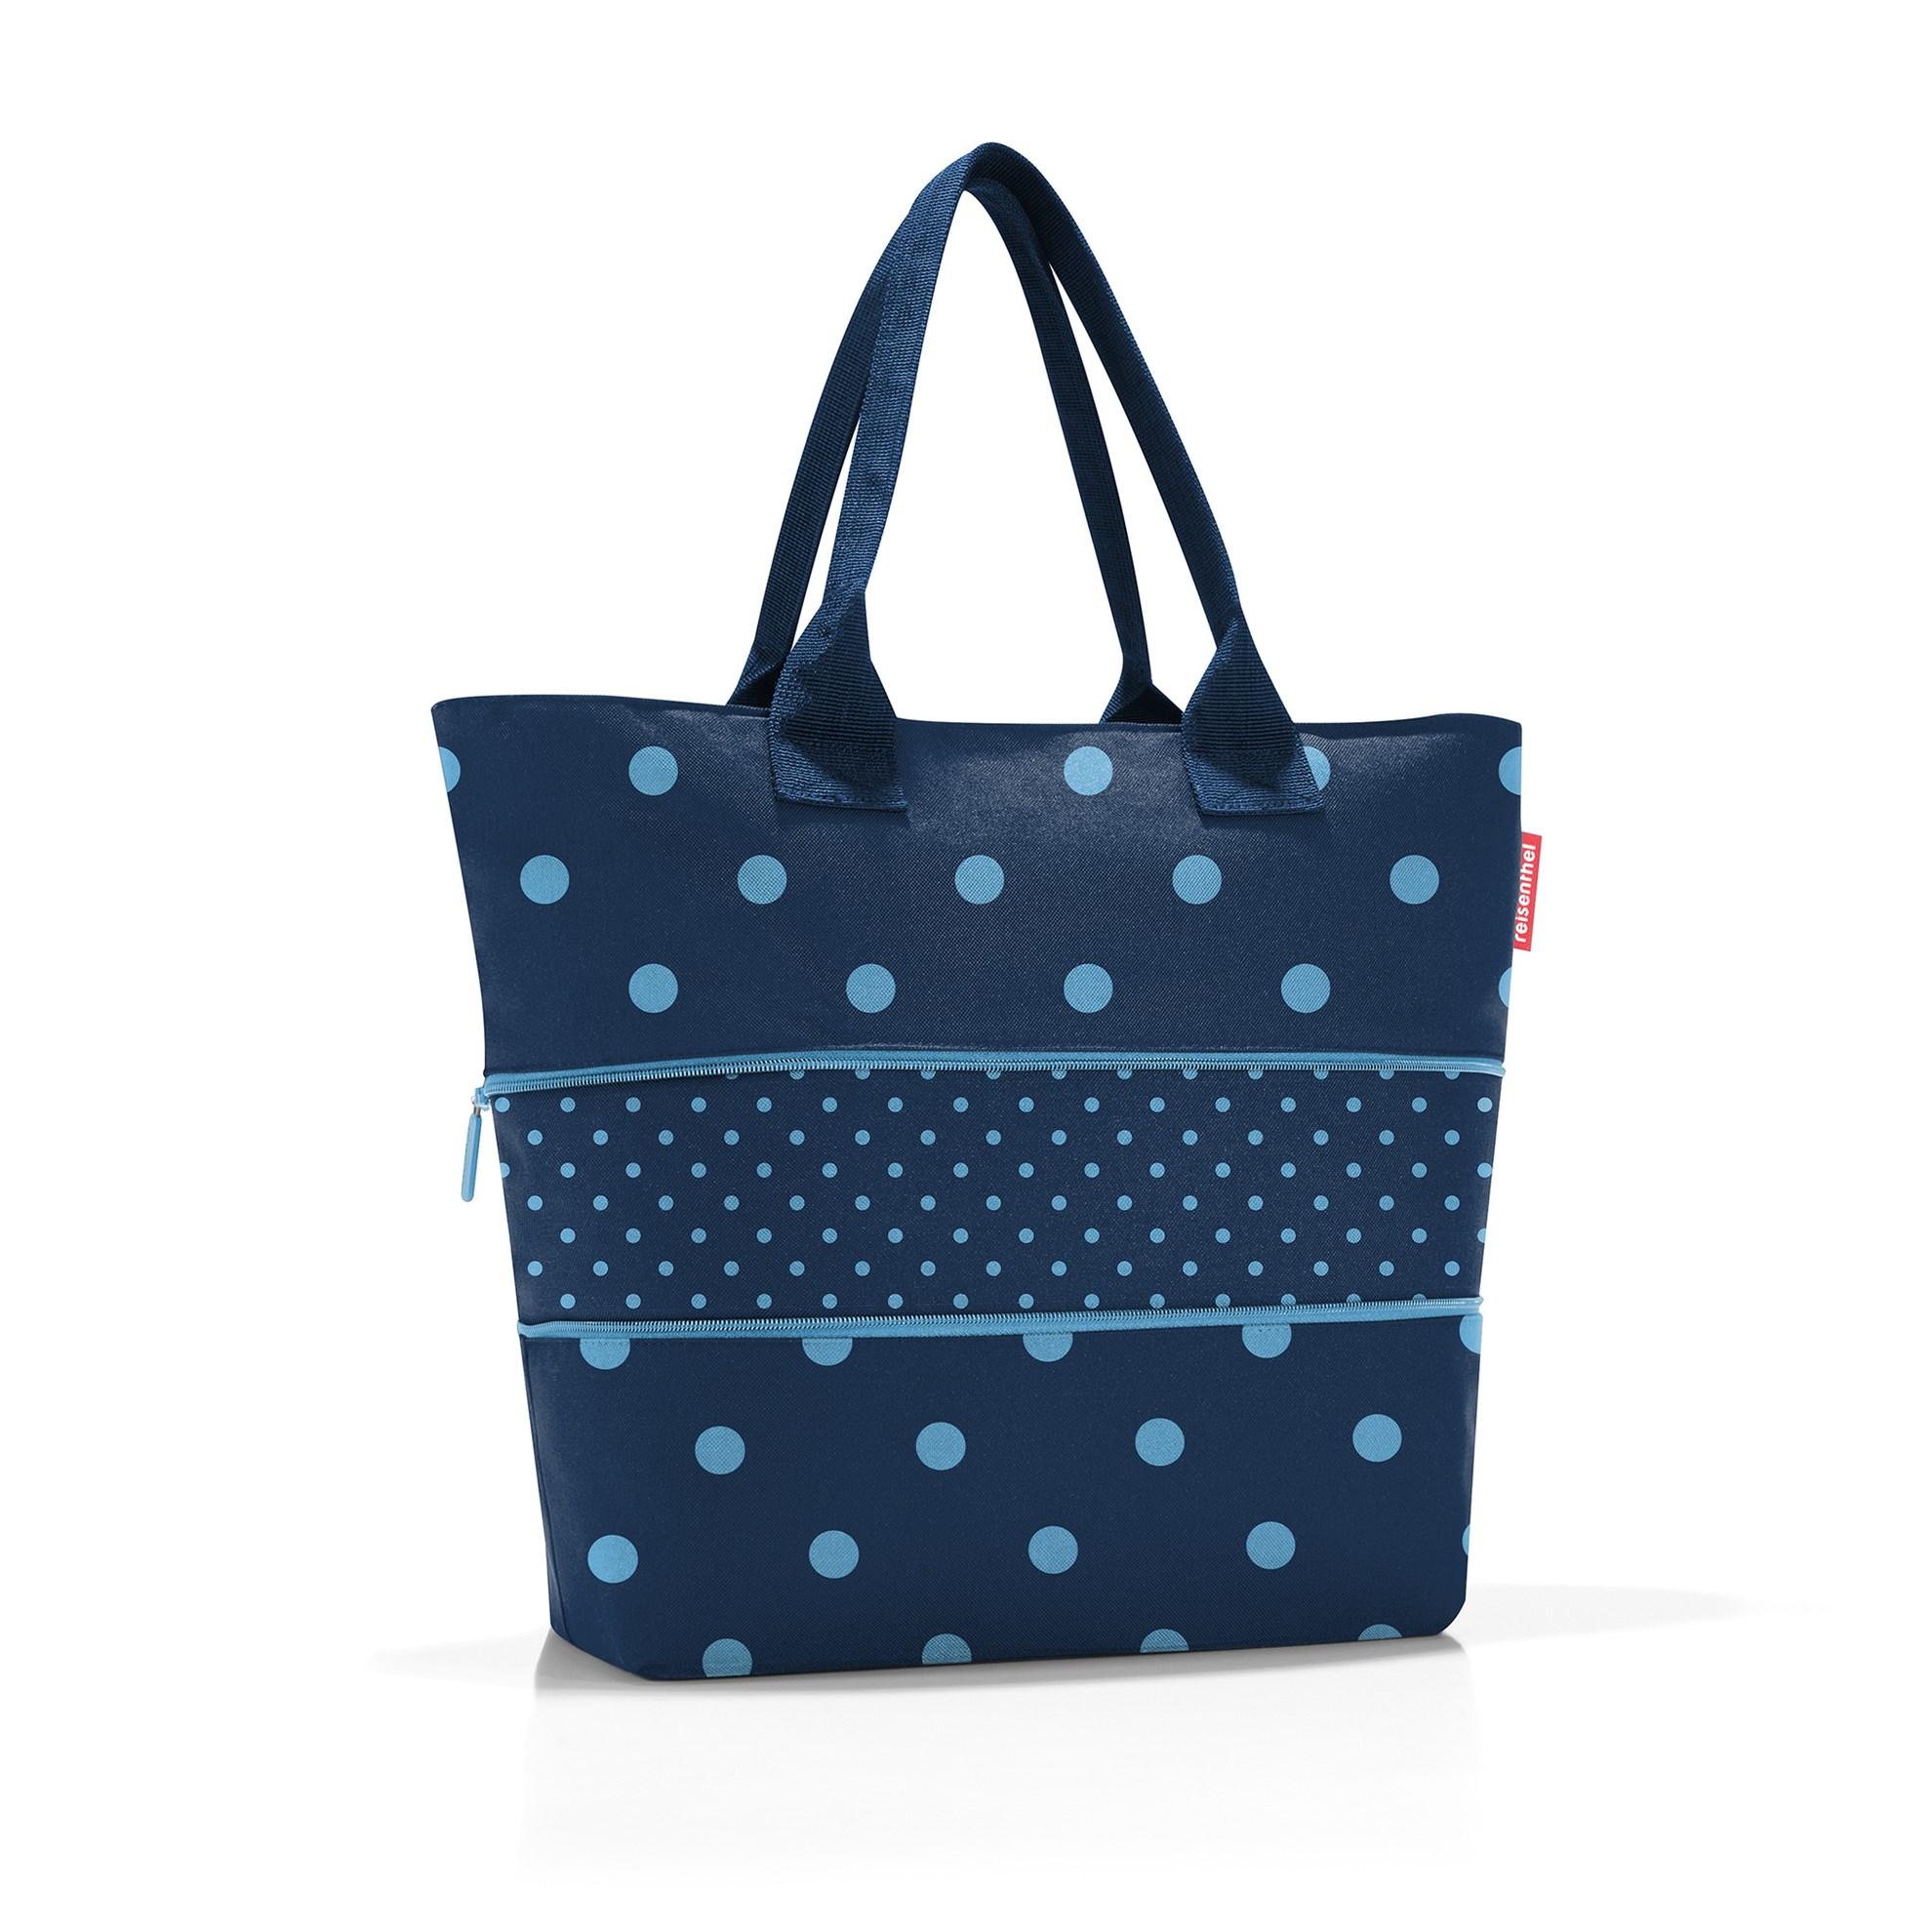 Chytrá taška přes rameno Shopper e1 mixed dots blue_1